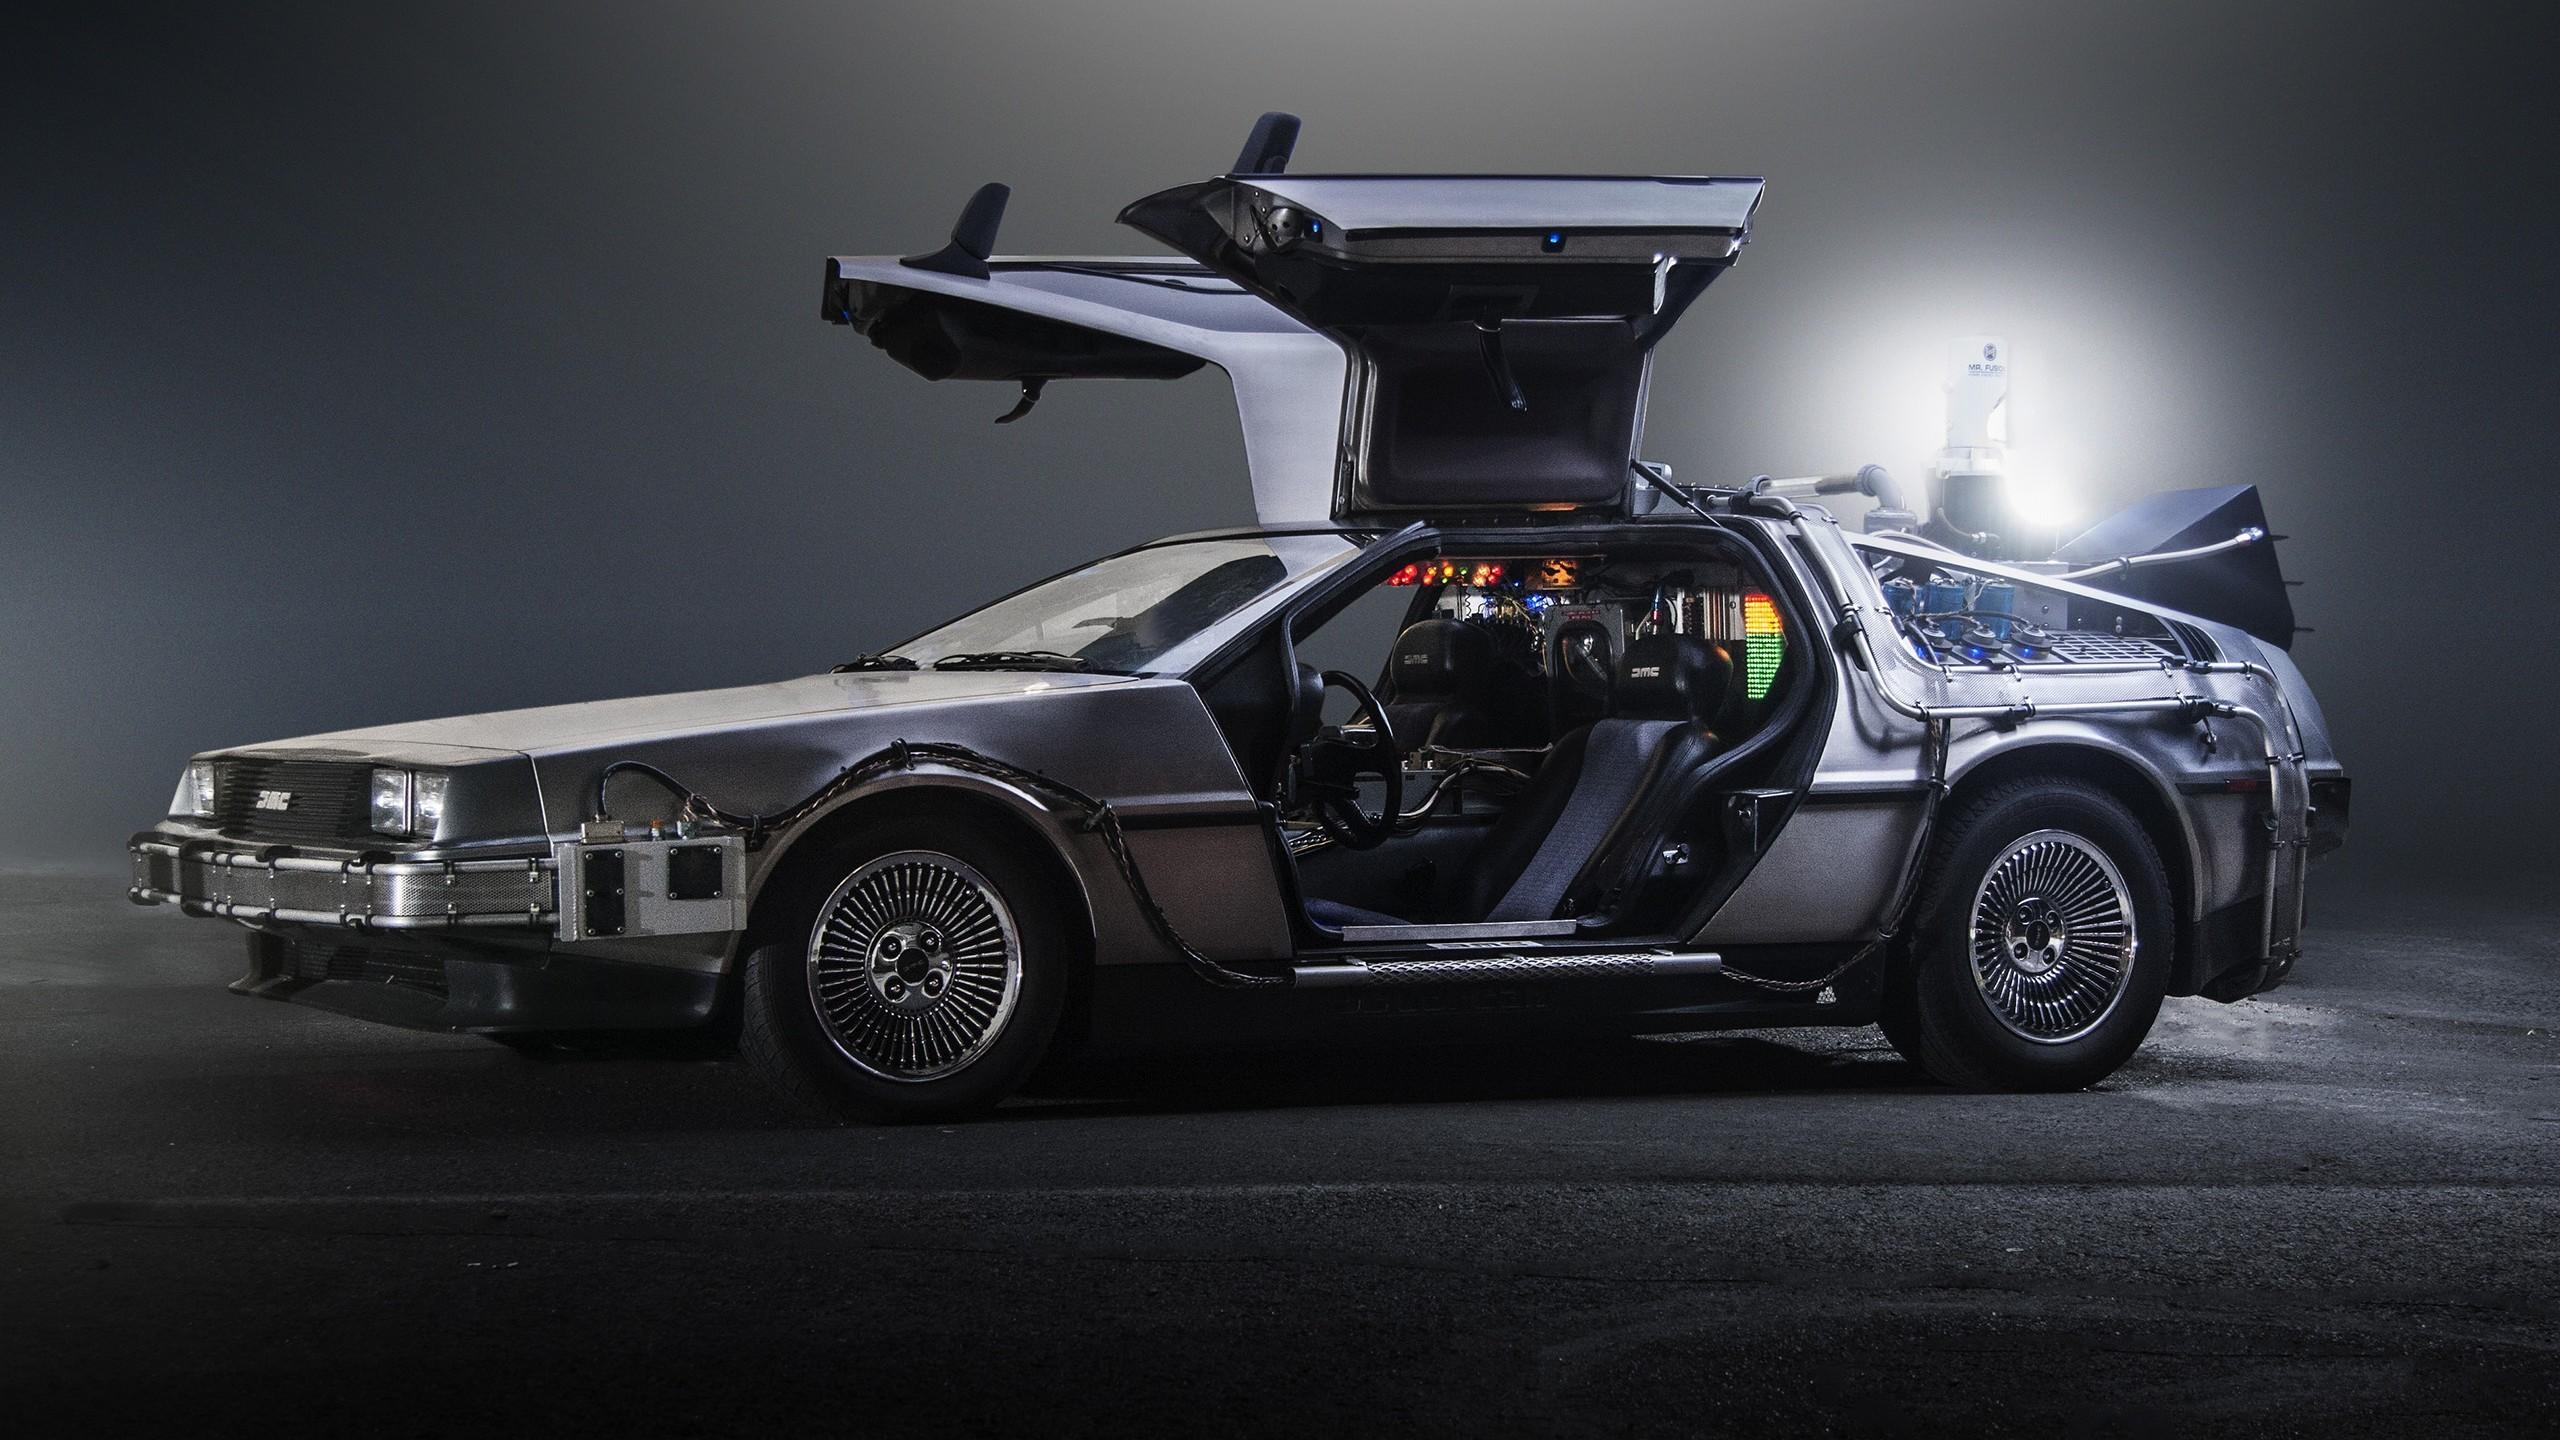 1024×768 1280×720 1280×800 1366×768 1440×900 1600×900 1680×1050 1920×1080  1920×1200 2560×1440. Tags: DeLorean time machine, Back to the Future …